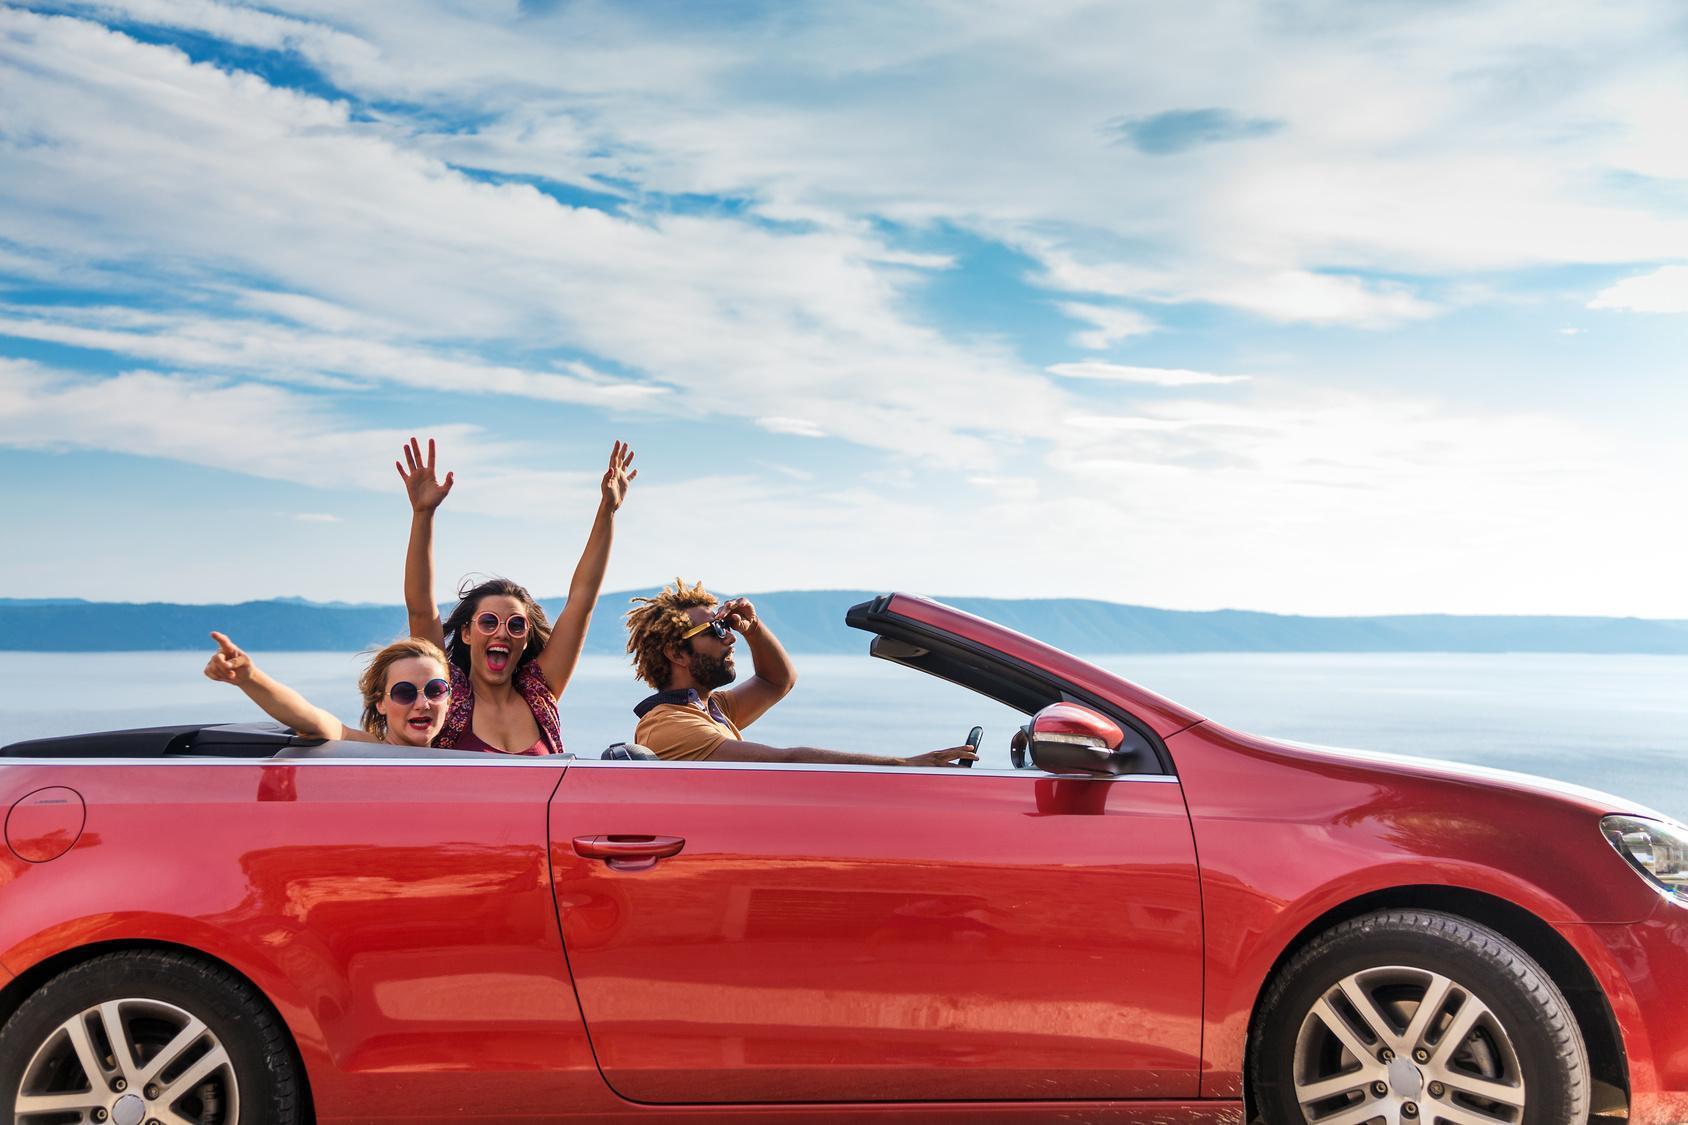 ofertas-para-aluguel-de-carros-20-03-17